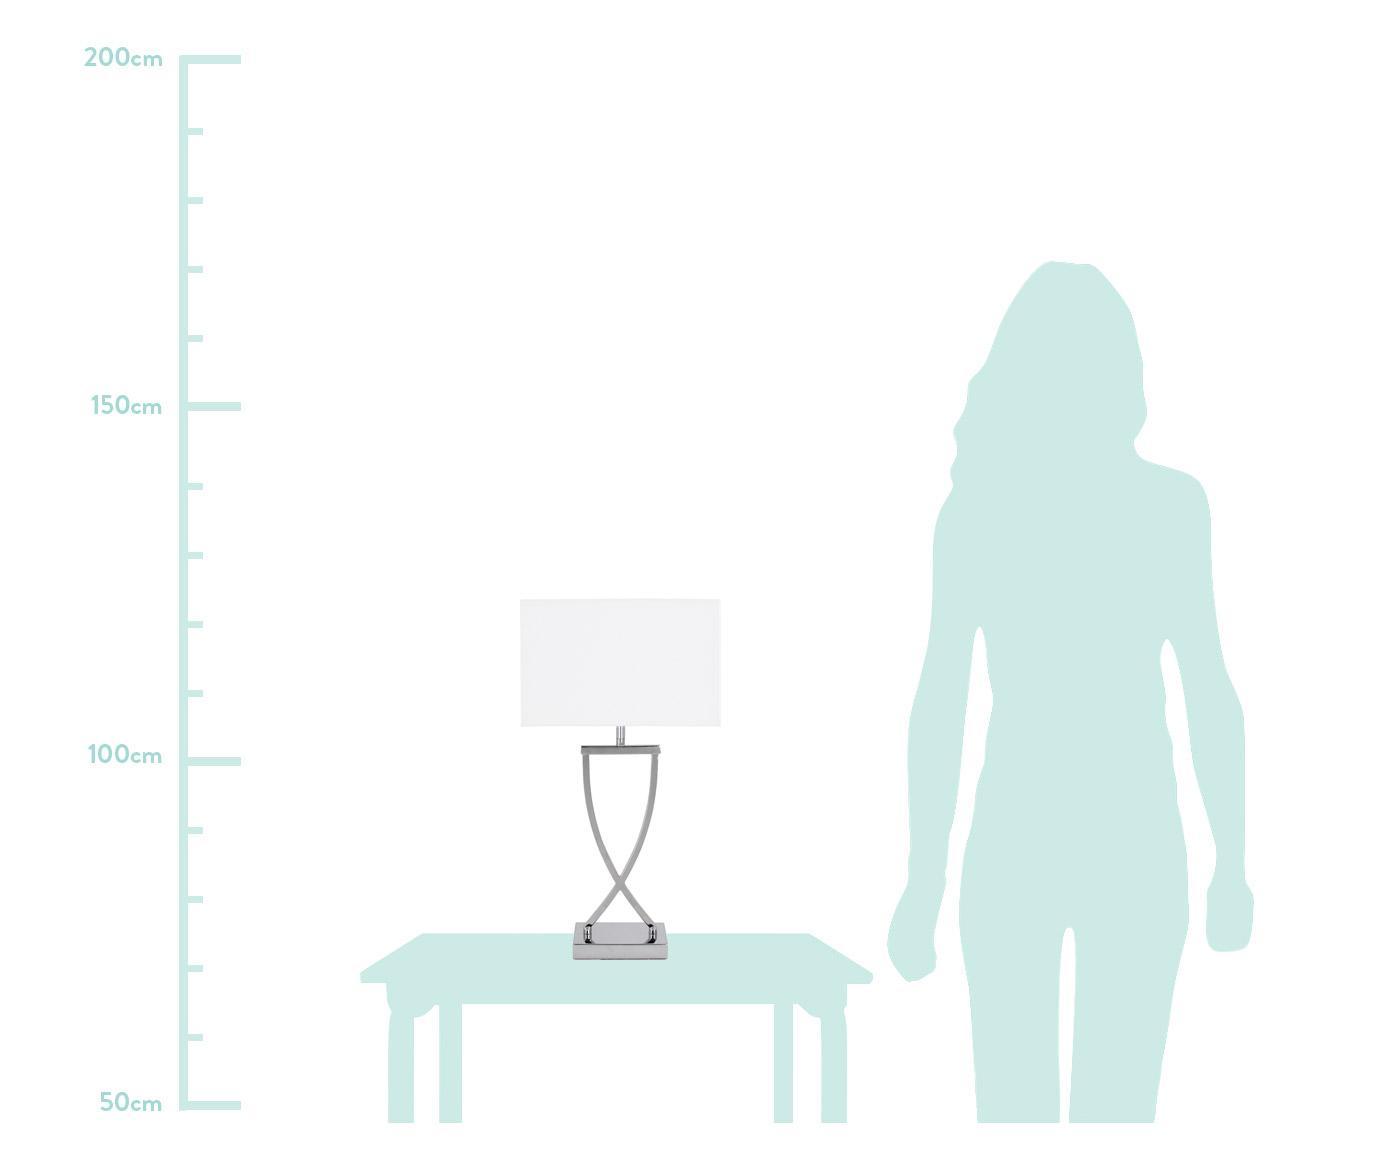 Tafellamp Vanessa, Lampvoet: metaal, Lampenkap: textiel, Lampvoet: chroomkleurig. Lampenkap: wit. Snoer: wit, 27 x 52 cm